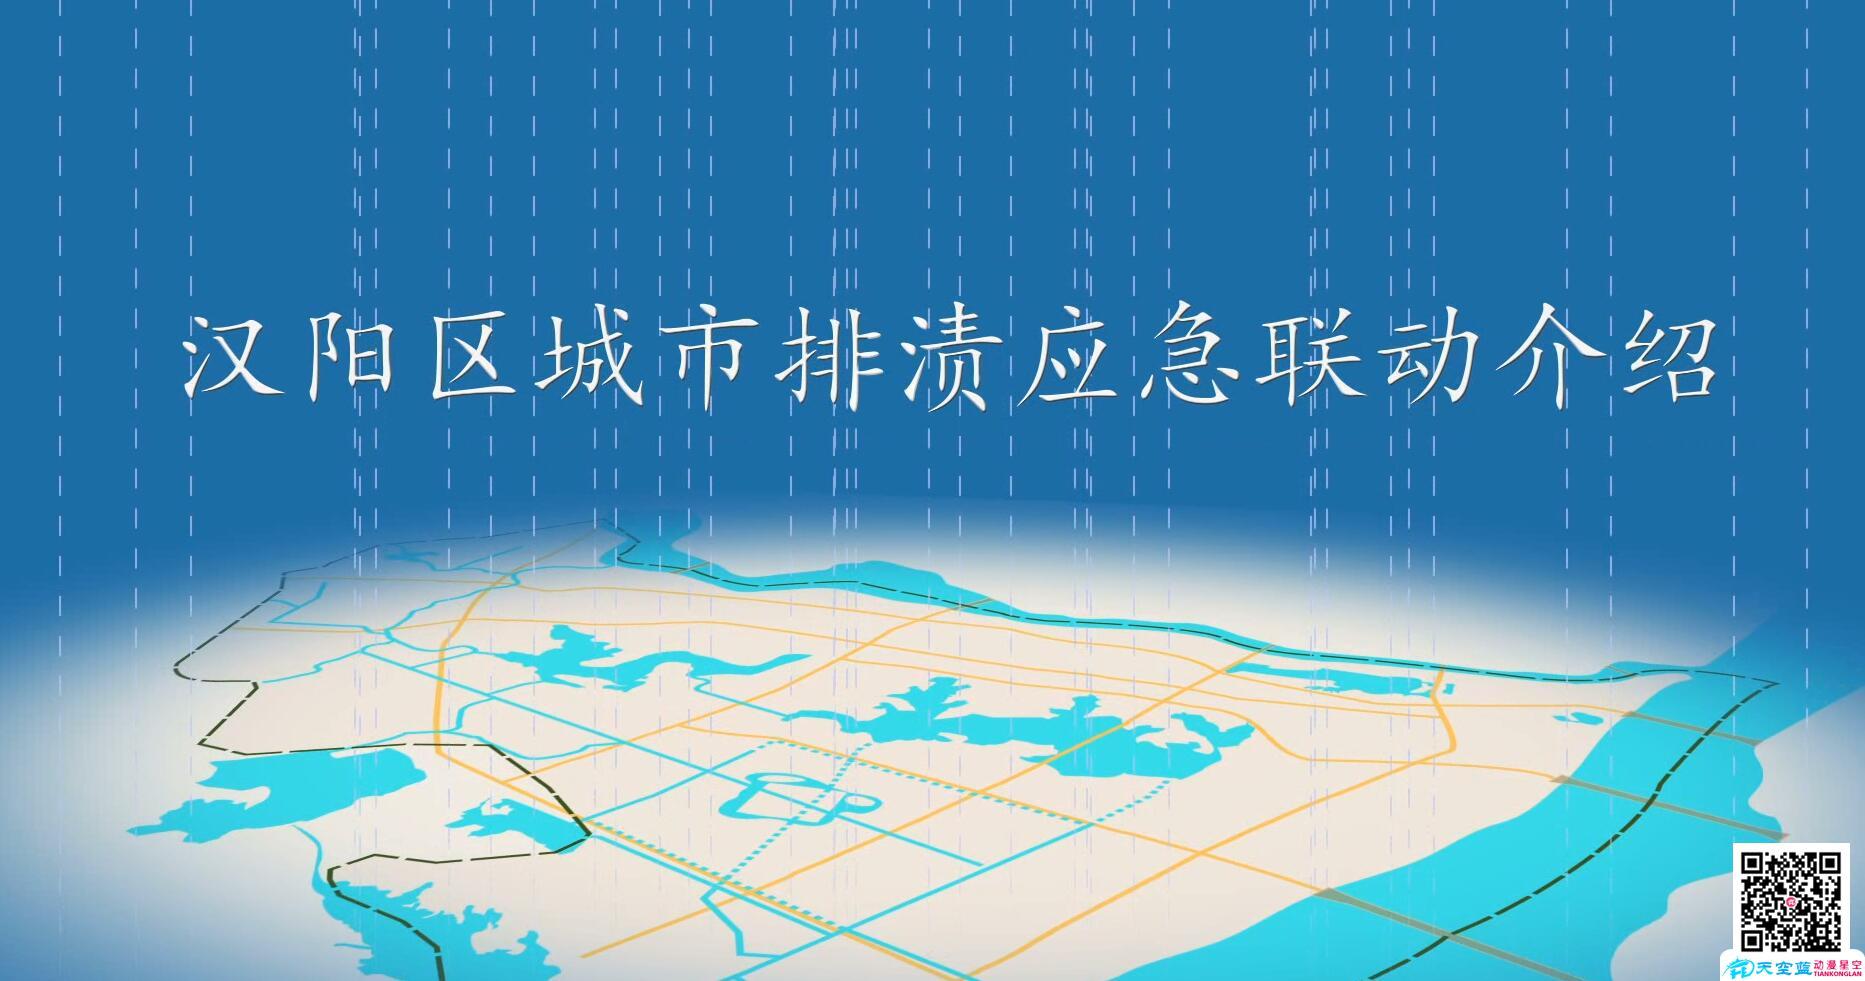 MG动画制作「武汉市汉阳区城市排渍应急联动介绍」动漫宣传视频